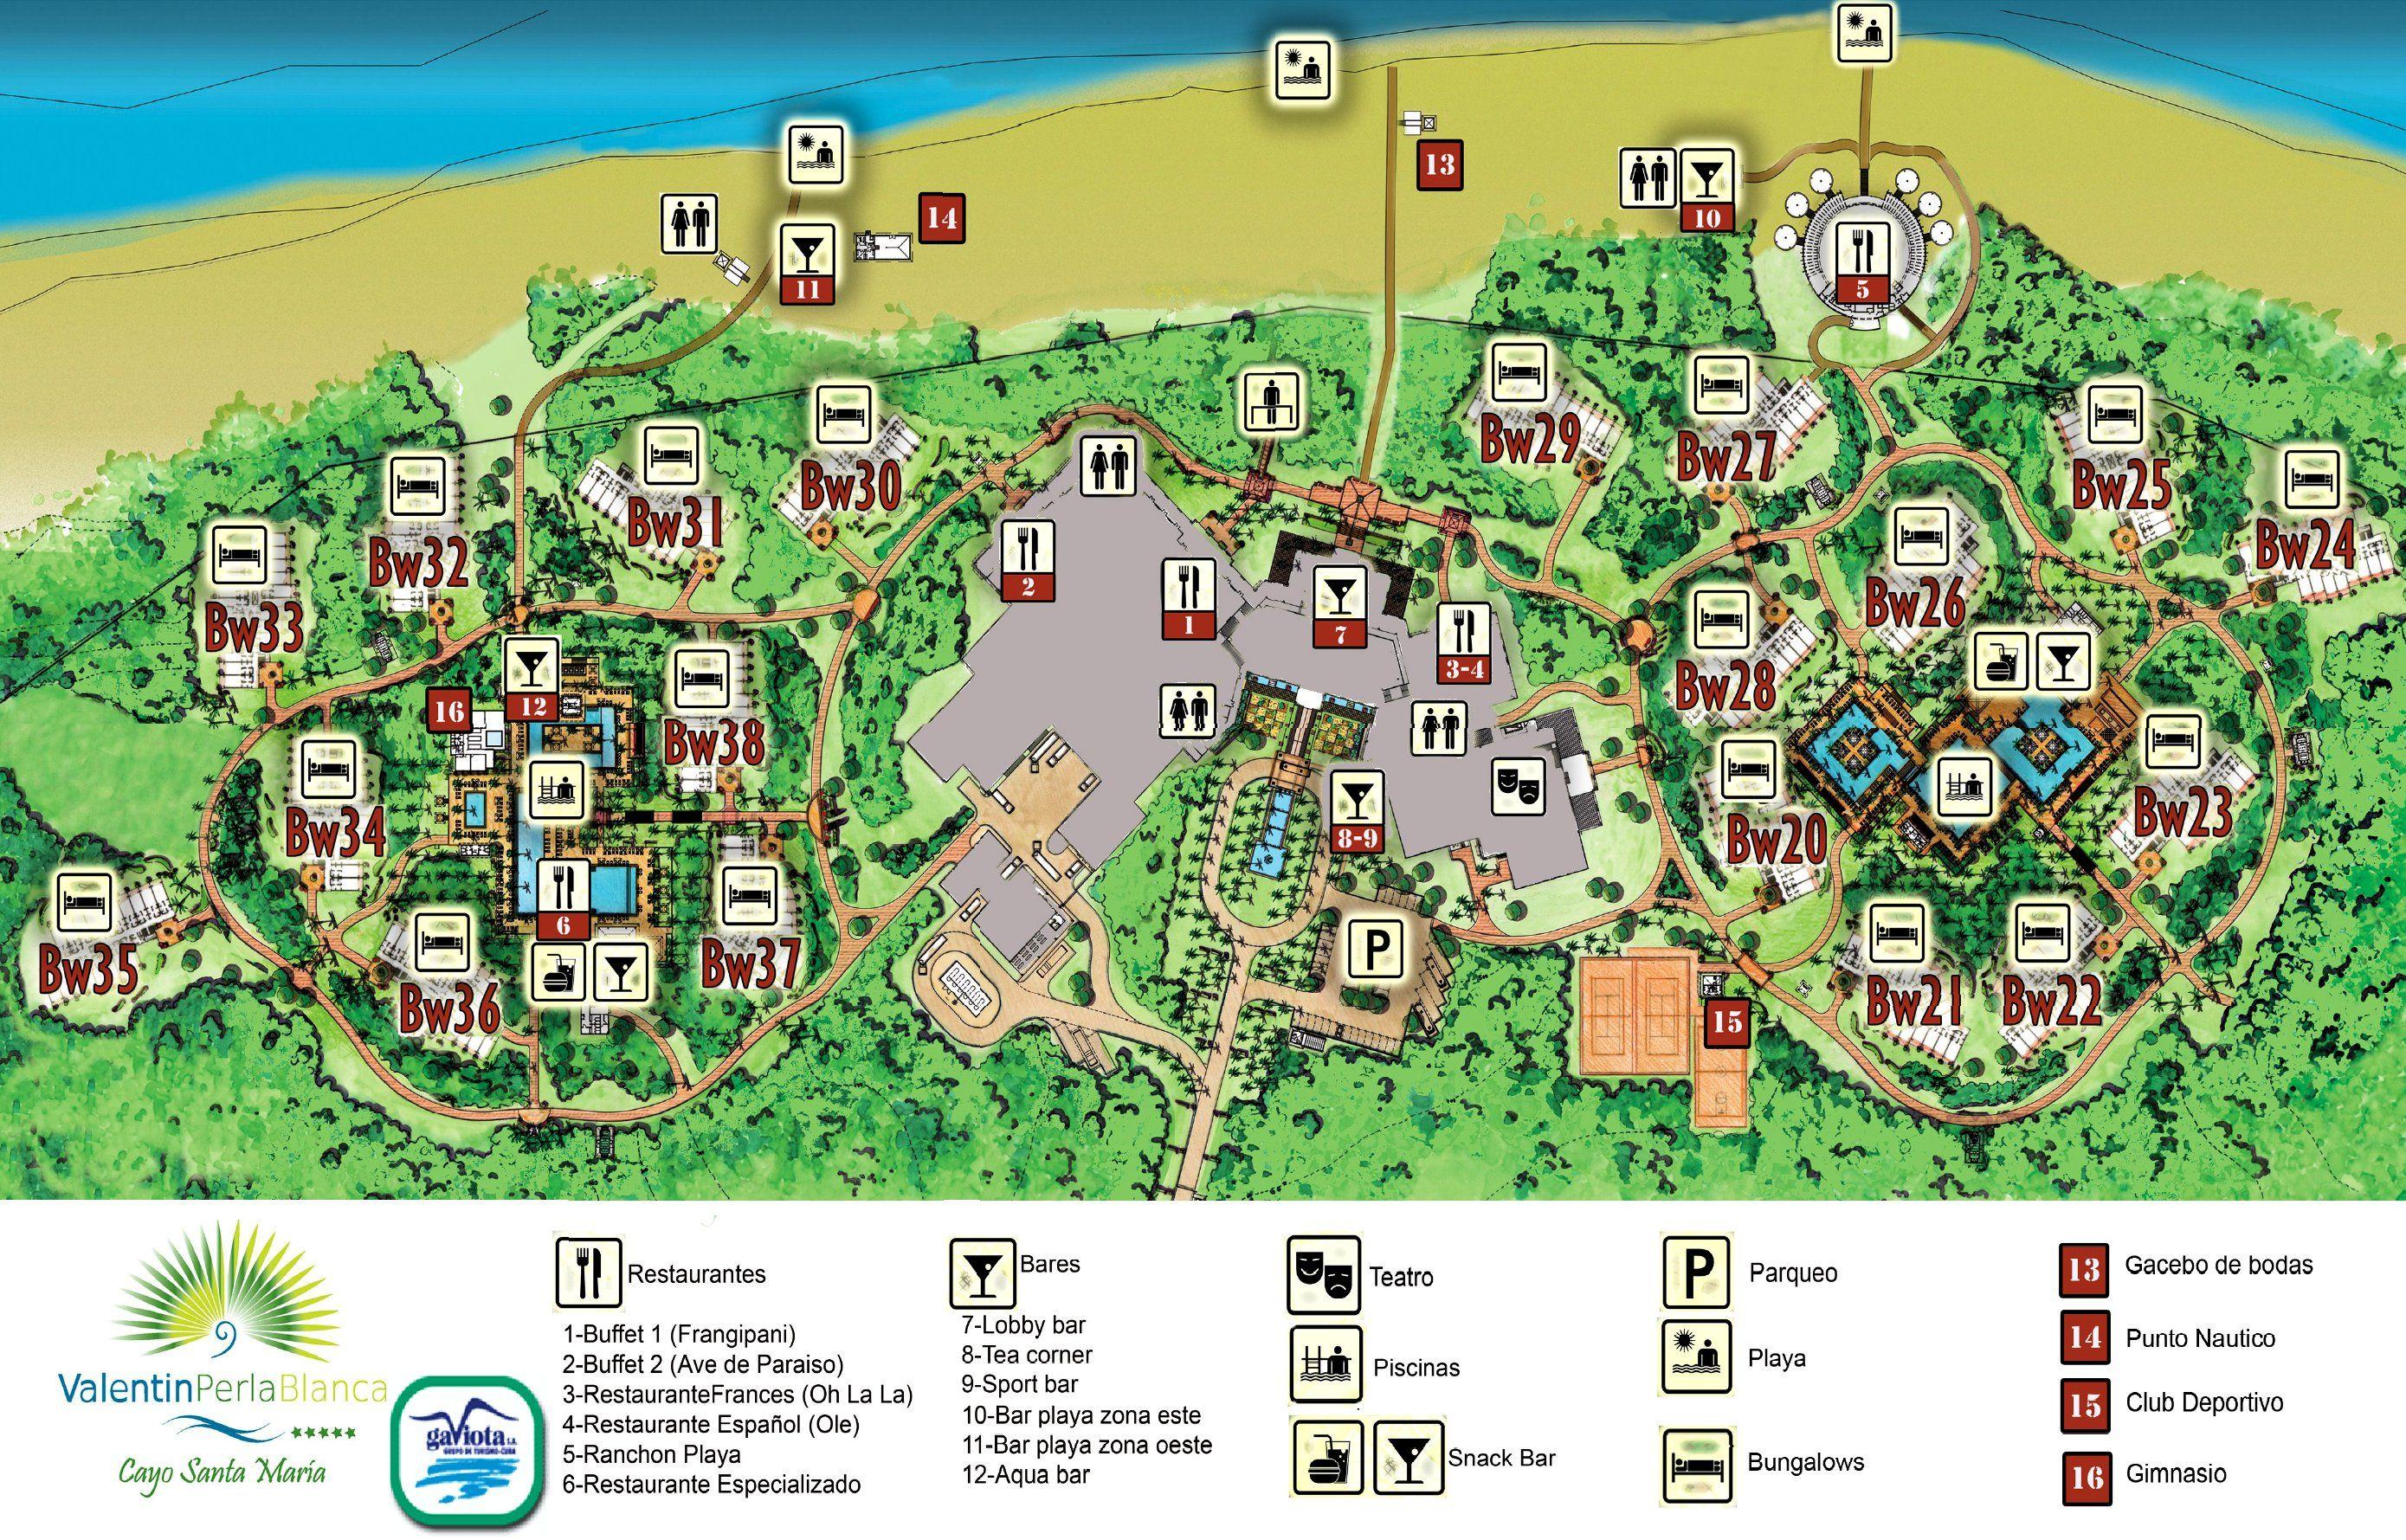 Map Layout Valentin Perla Blanca | Cuba in 2019 | Cayo santa ... on balboa park map, mountain view map, puerto rico map, solana beach map, old town map,